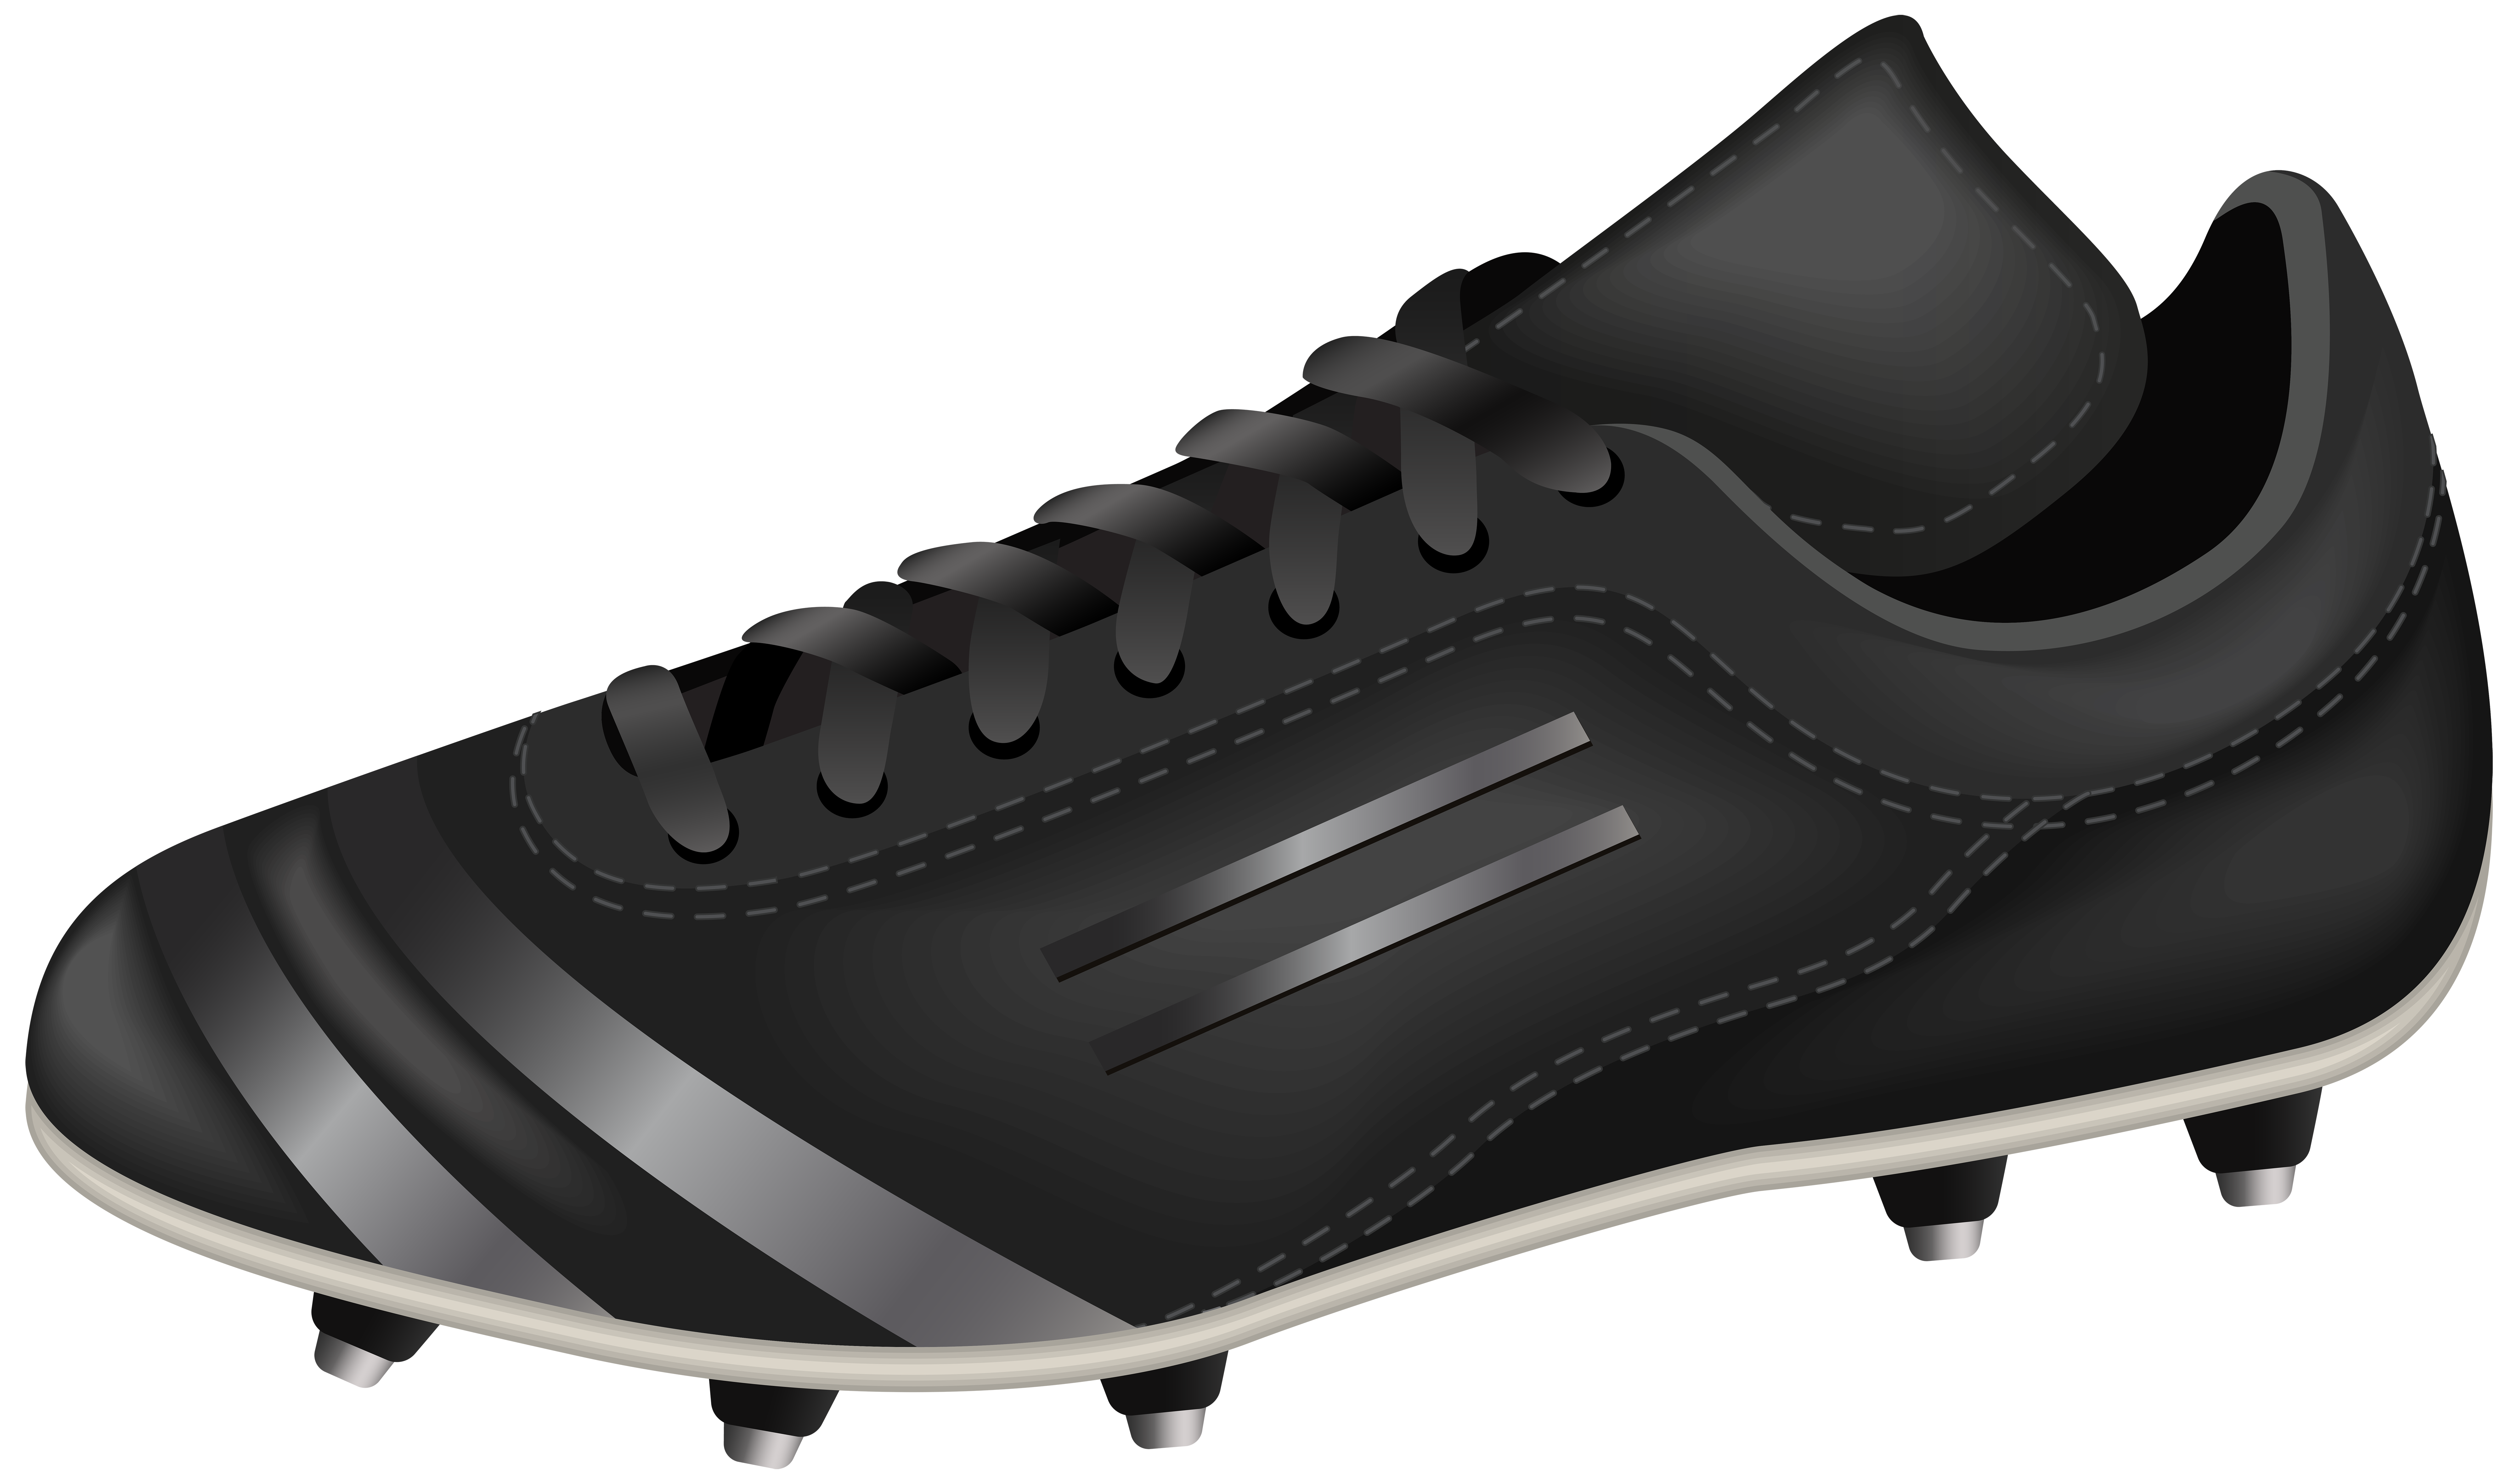 Football clipart football boot #8